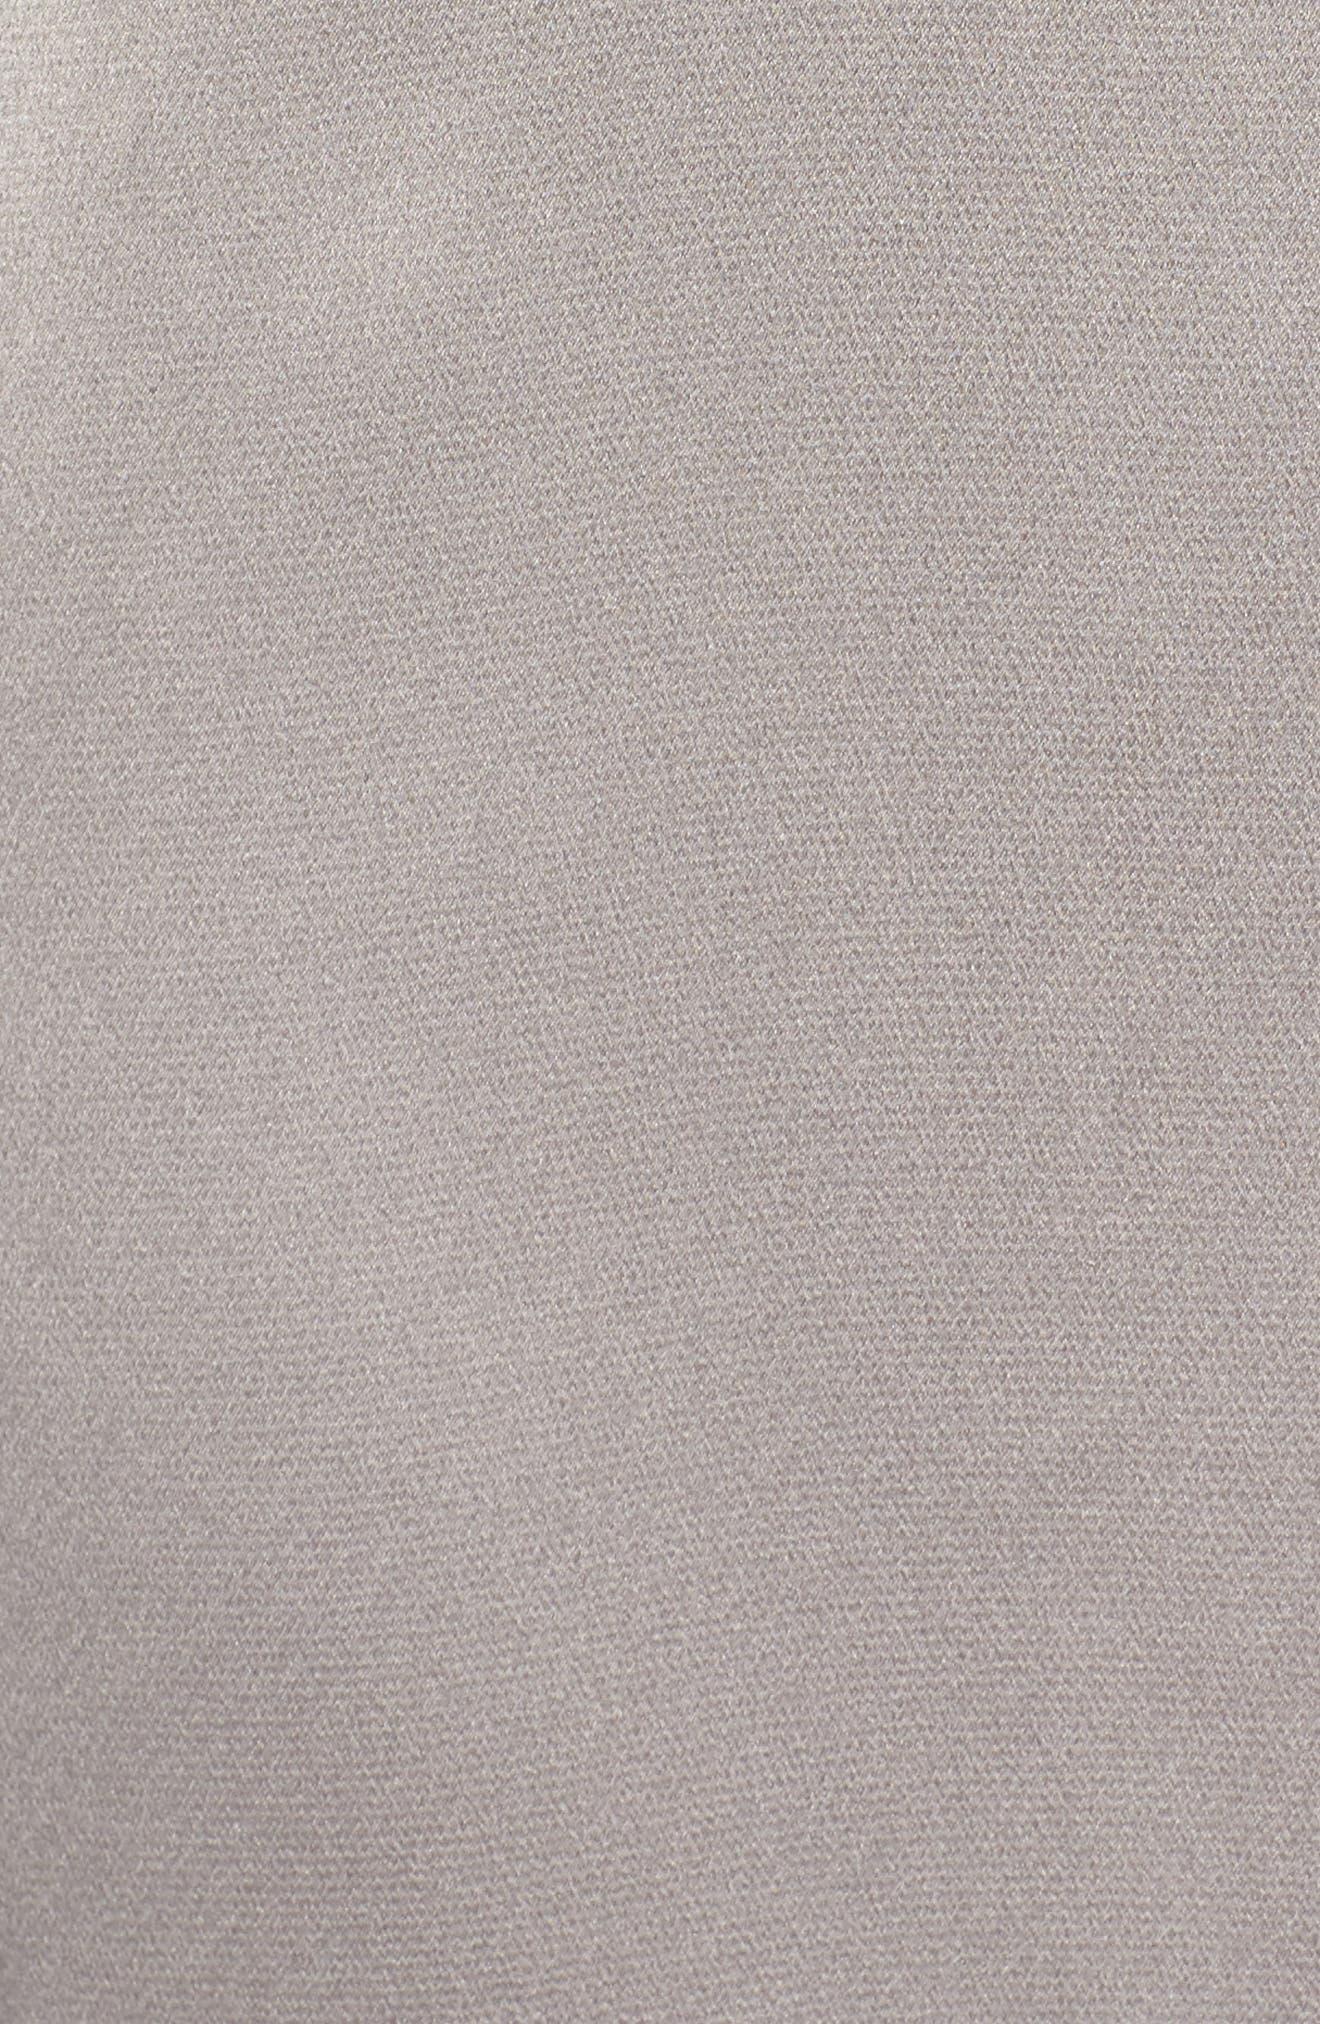 Satin Duster Jacket,                             Alternate thumbnail 6, color,                             020